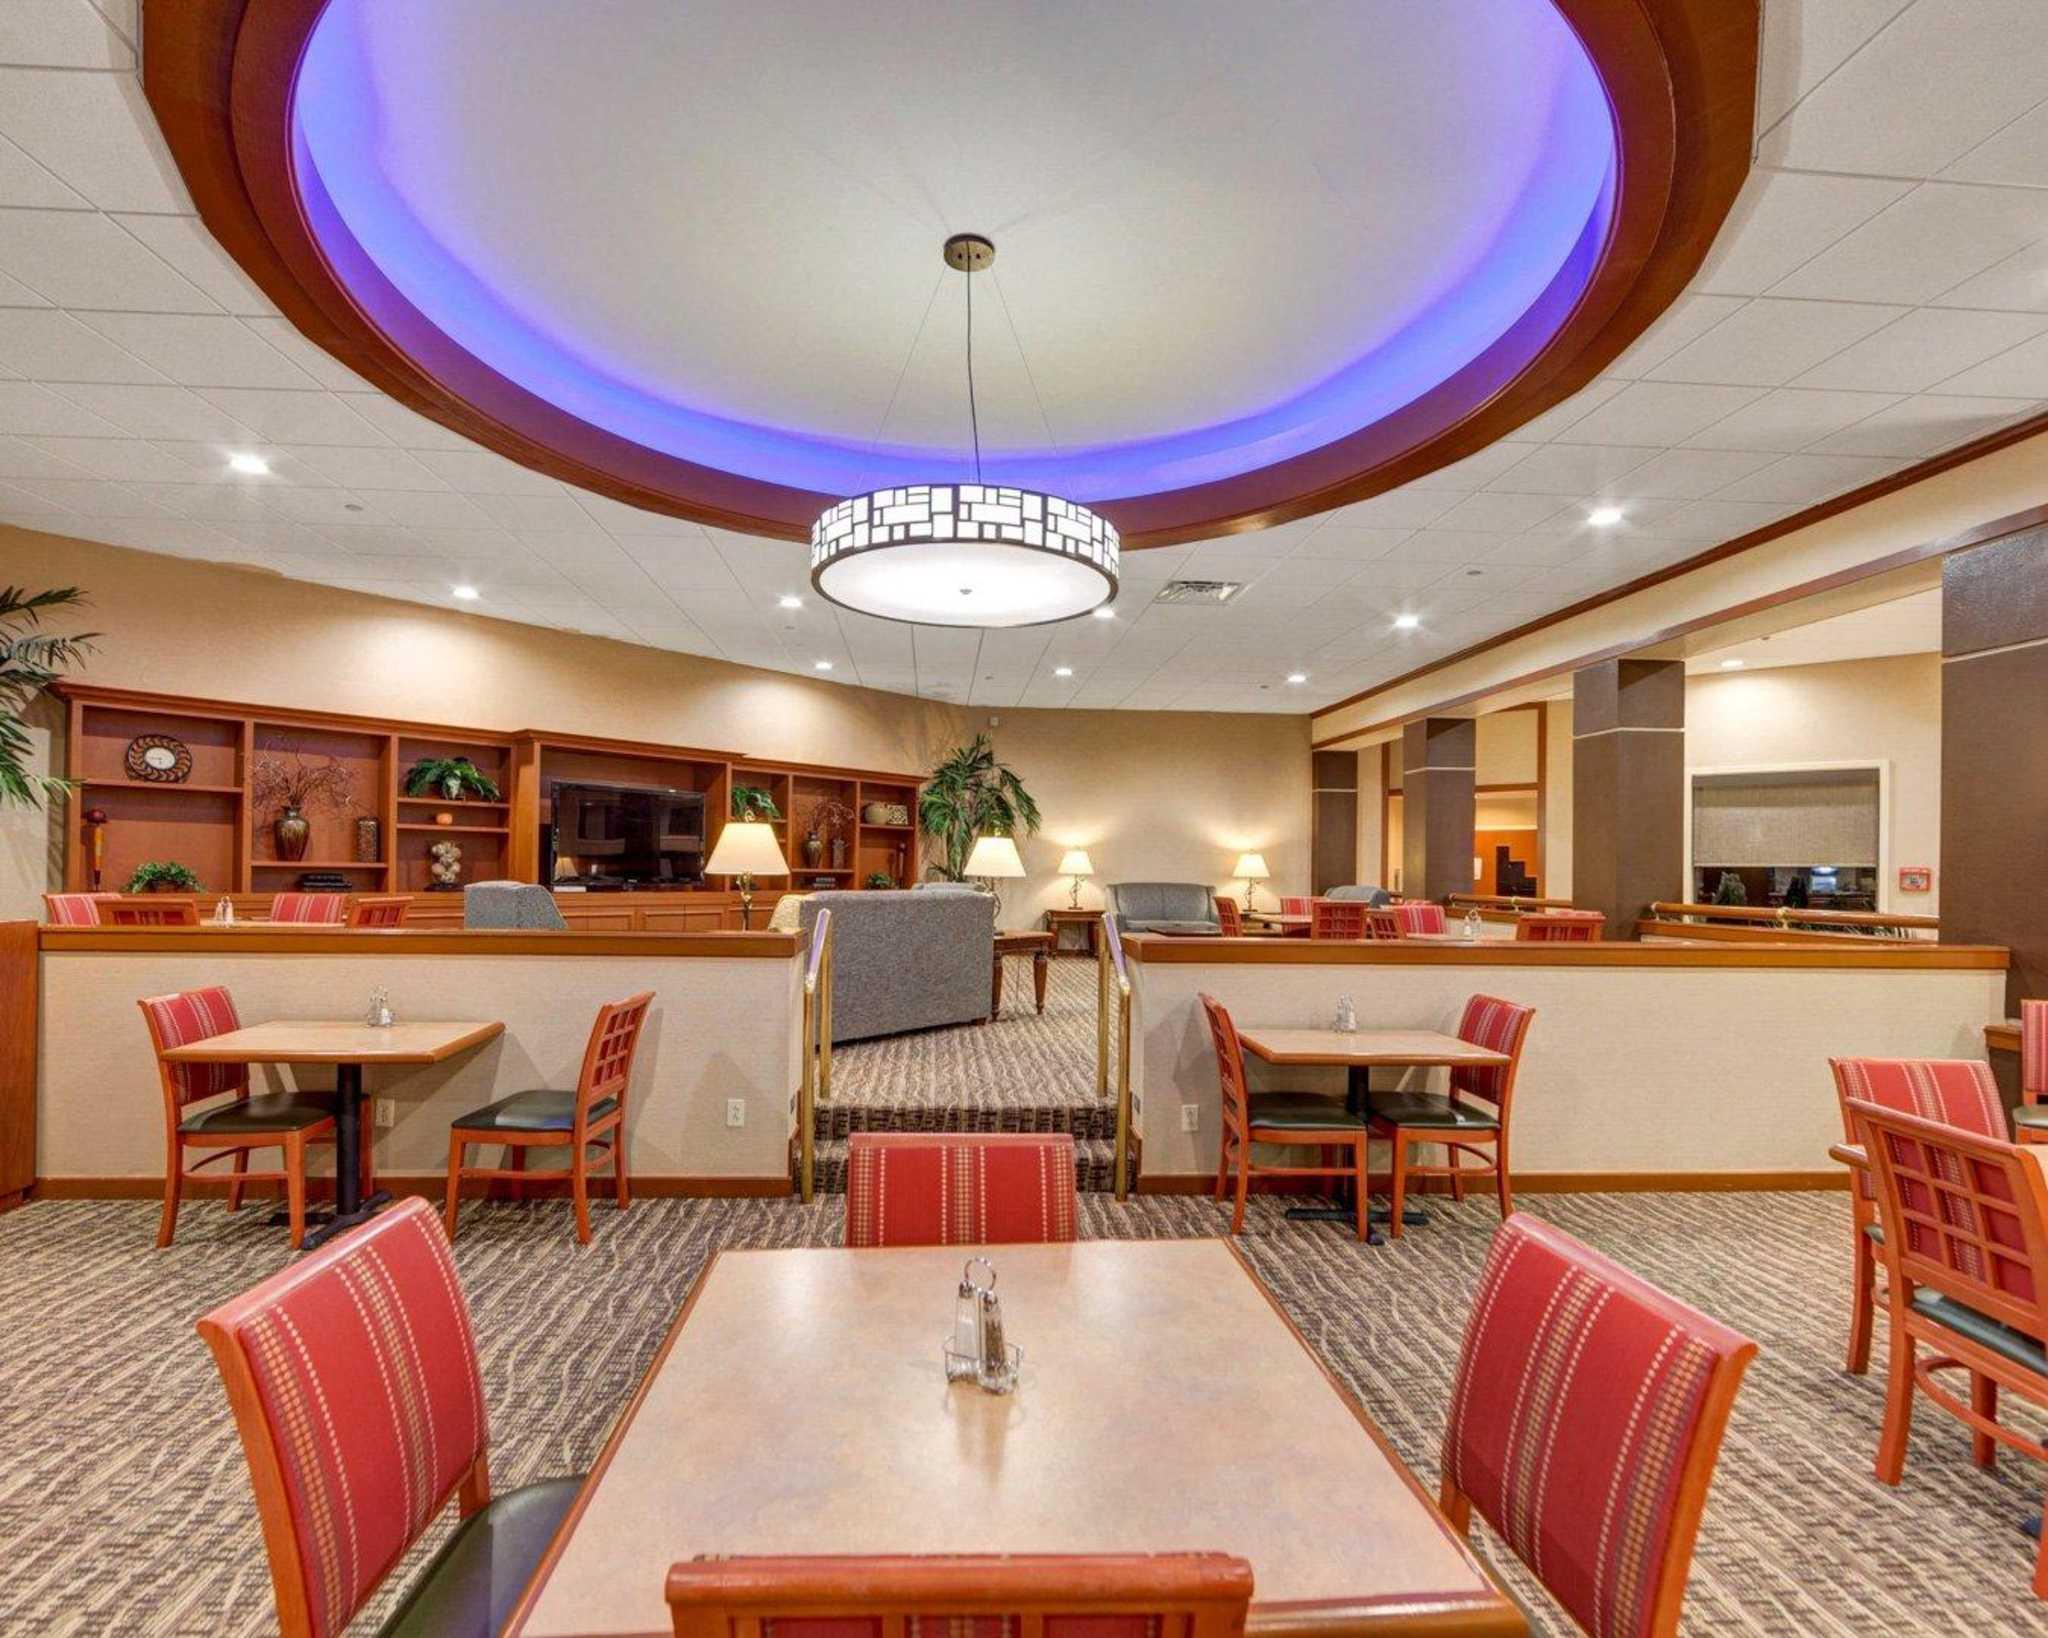 Comfort Inn & Suites Plano East image 32